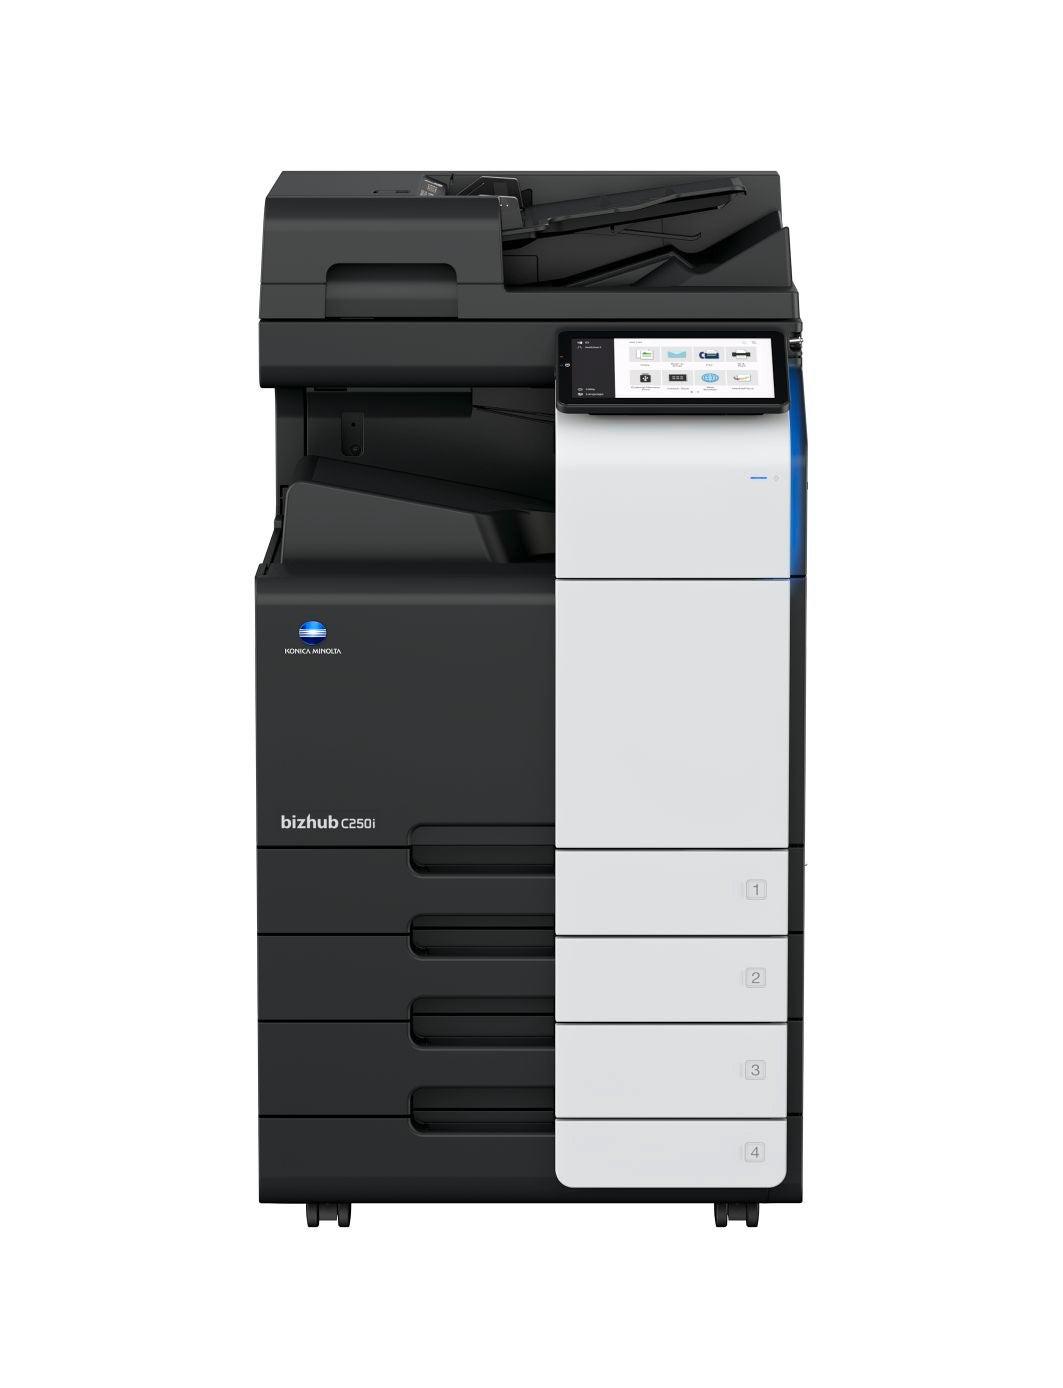 Imprimante de bureau Konica Minolta bizhub C250i